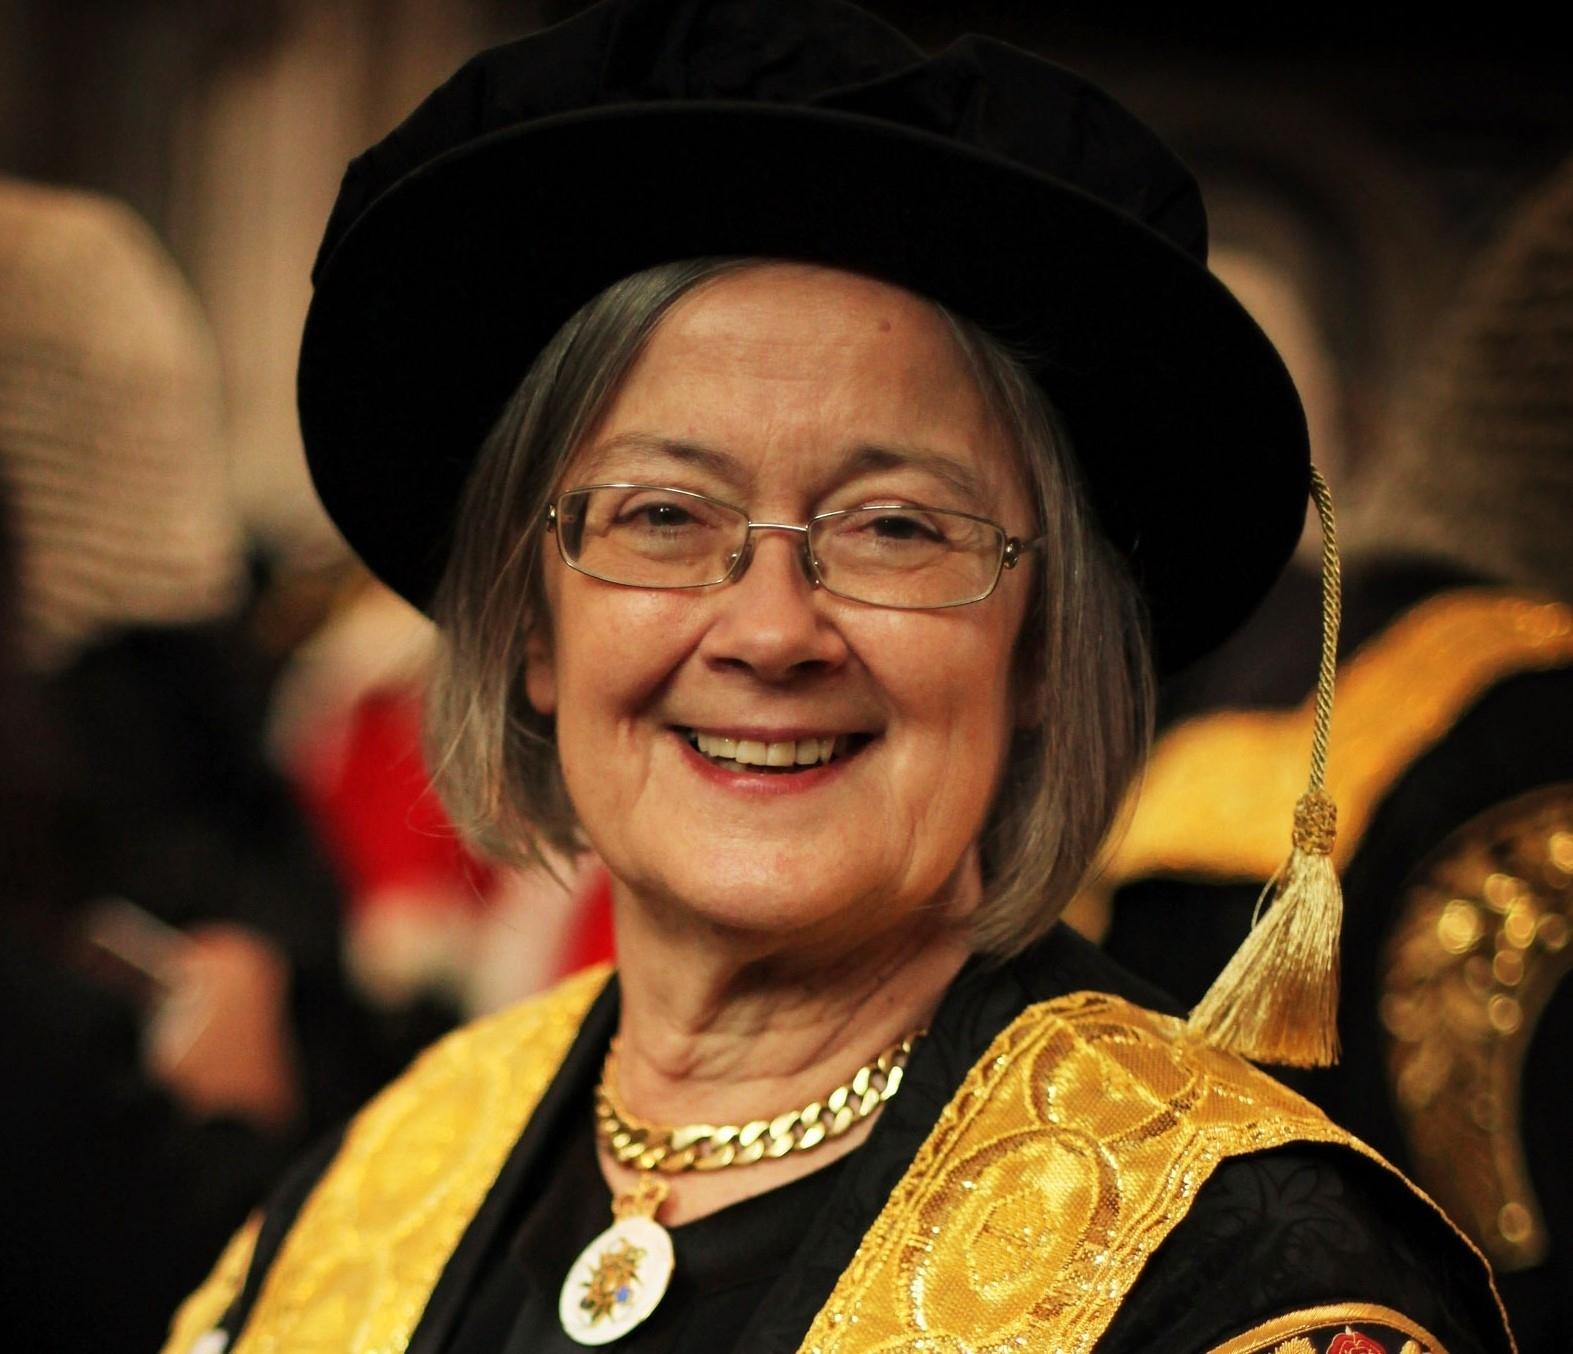 Baroness Hale of Richmond